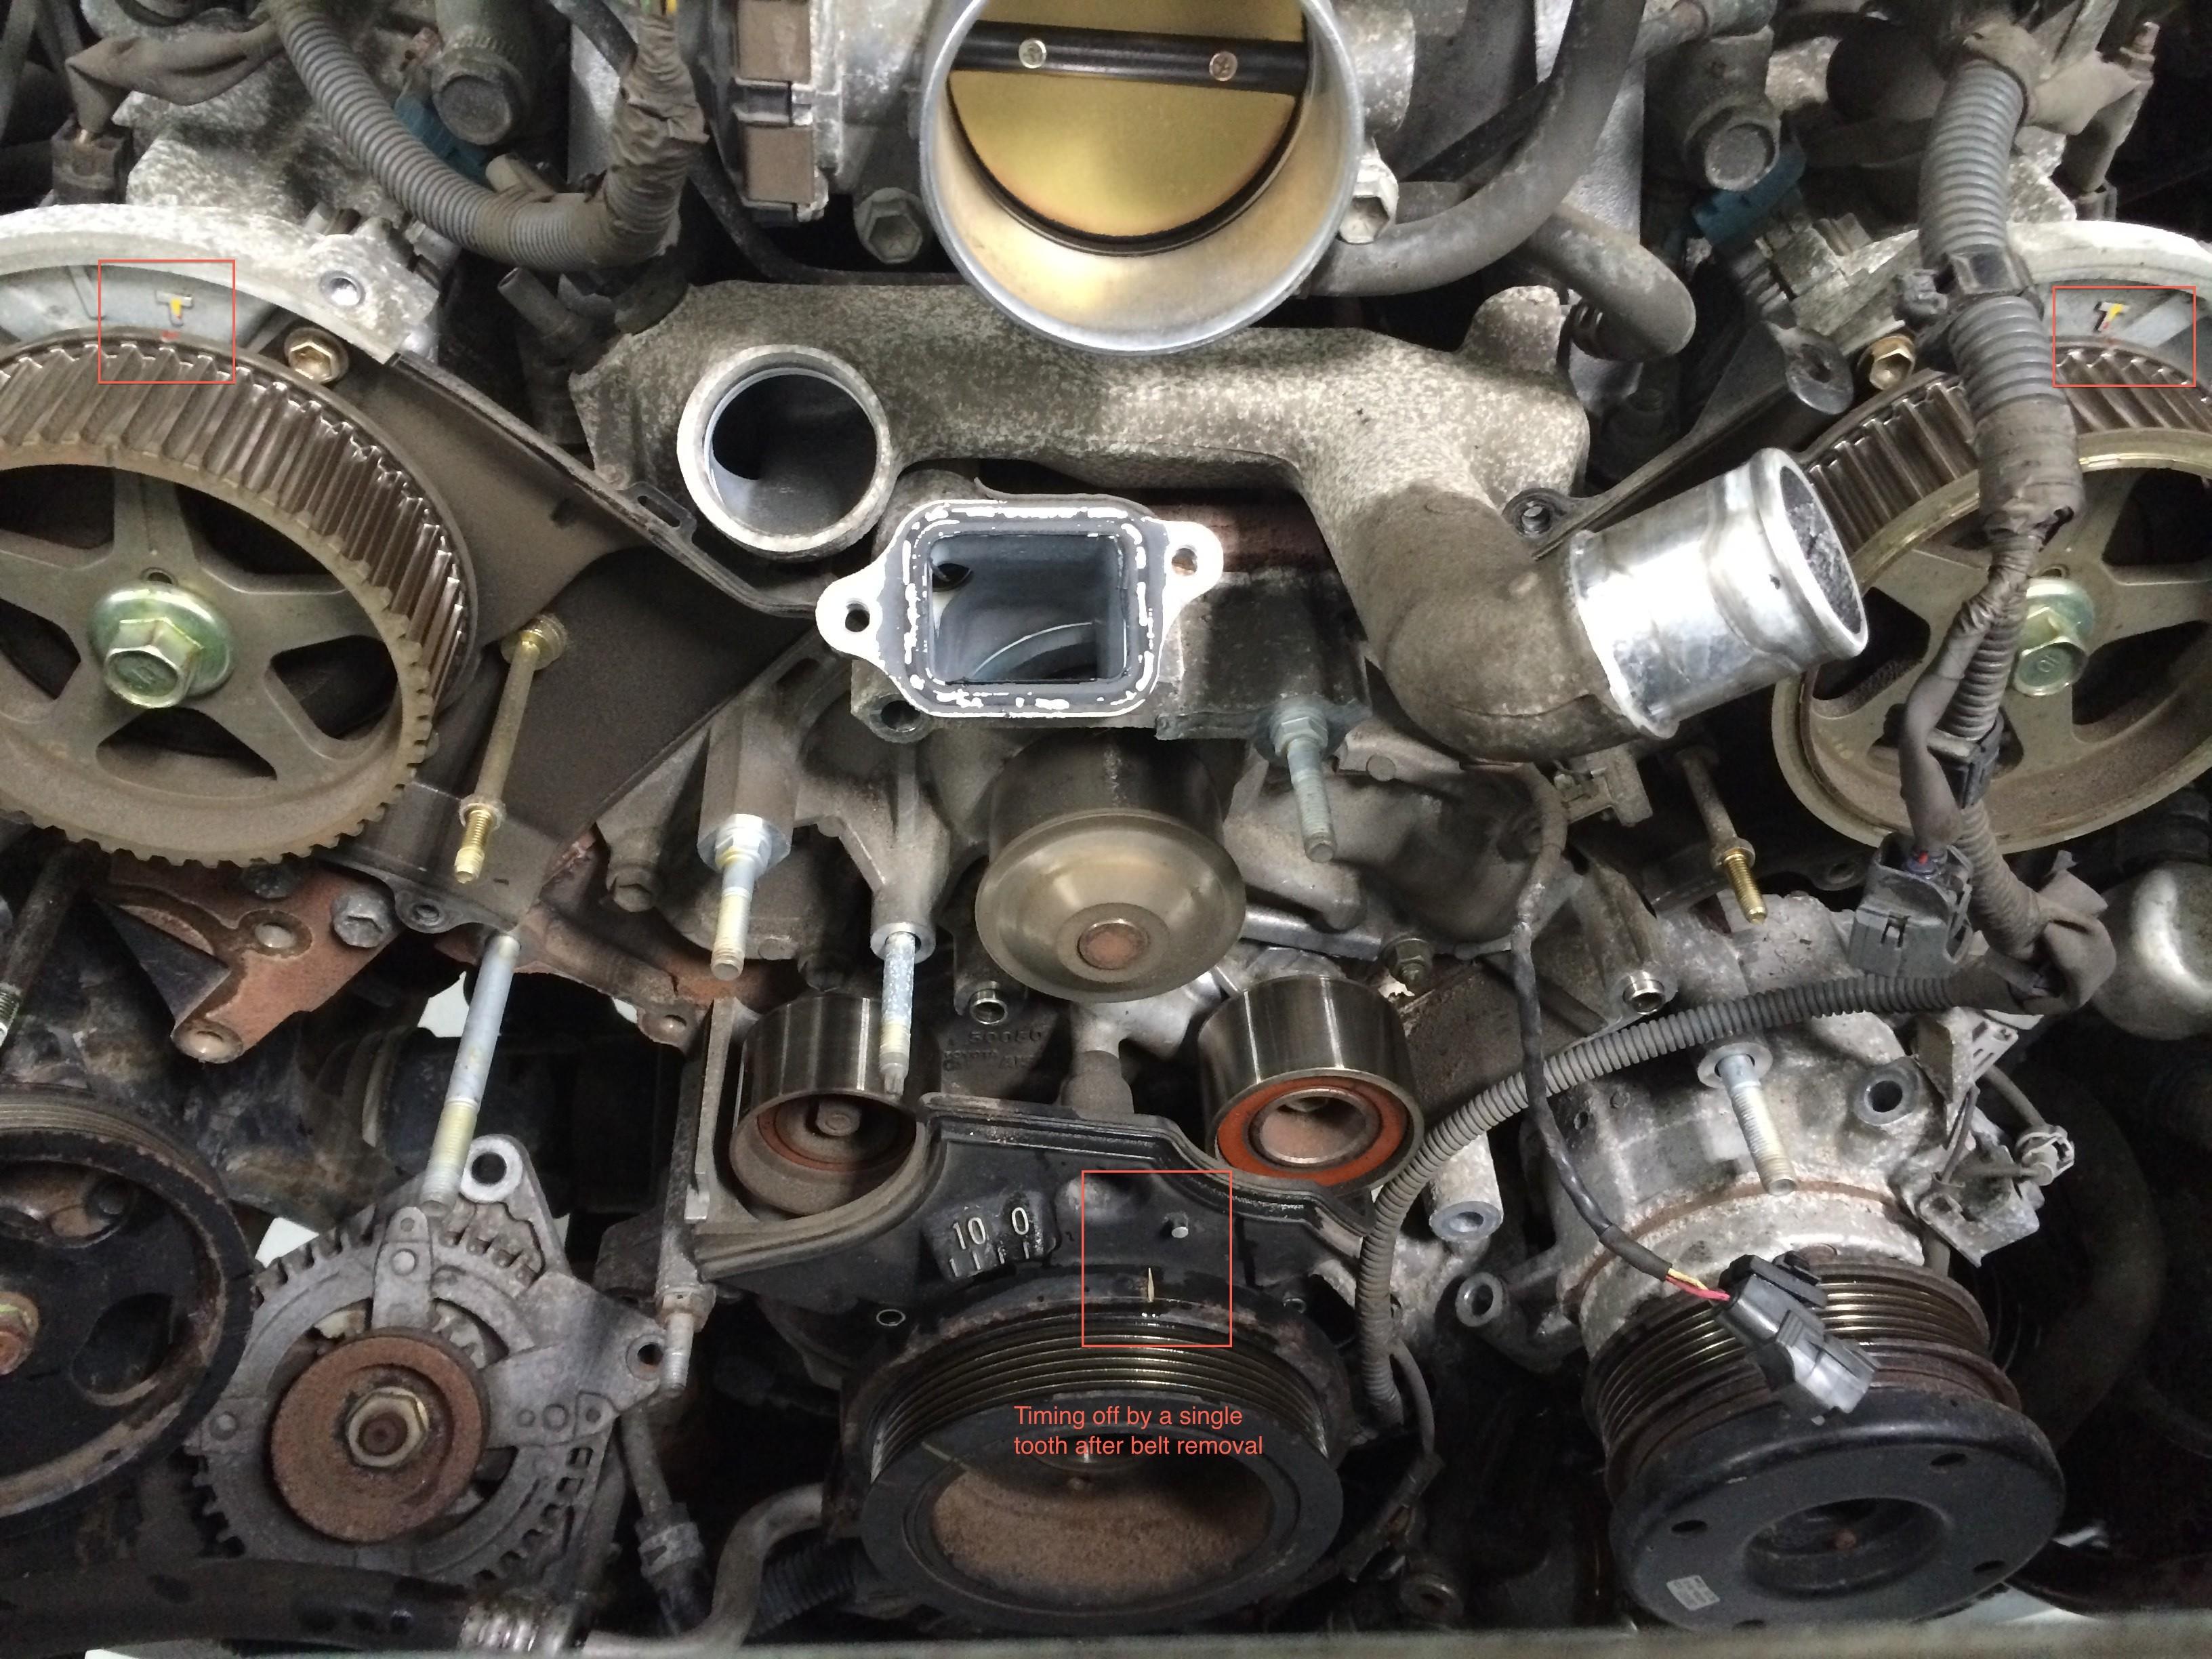 2001 toyota Sequoia Engine Diagram toyota and Lexus 4 7l V8 2uz Fe Timing  Belt Replacement